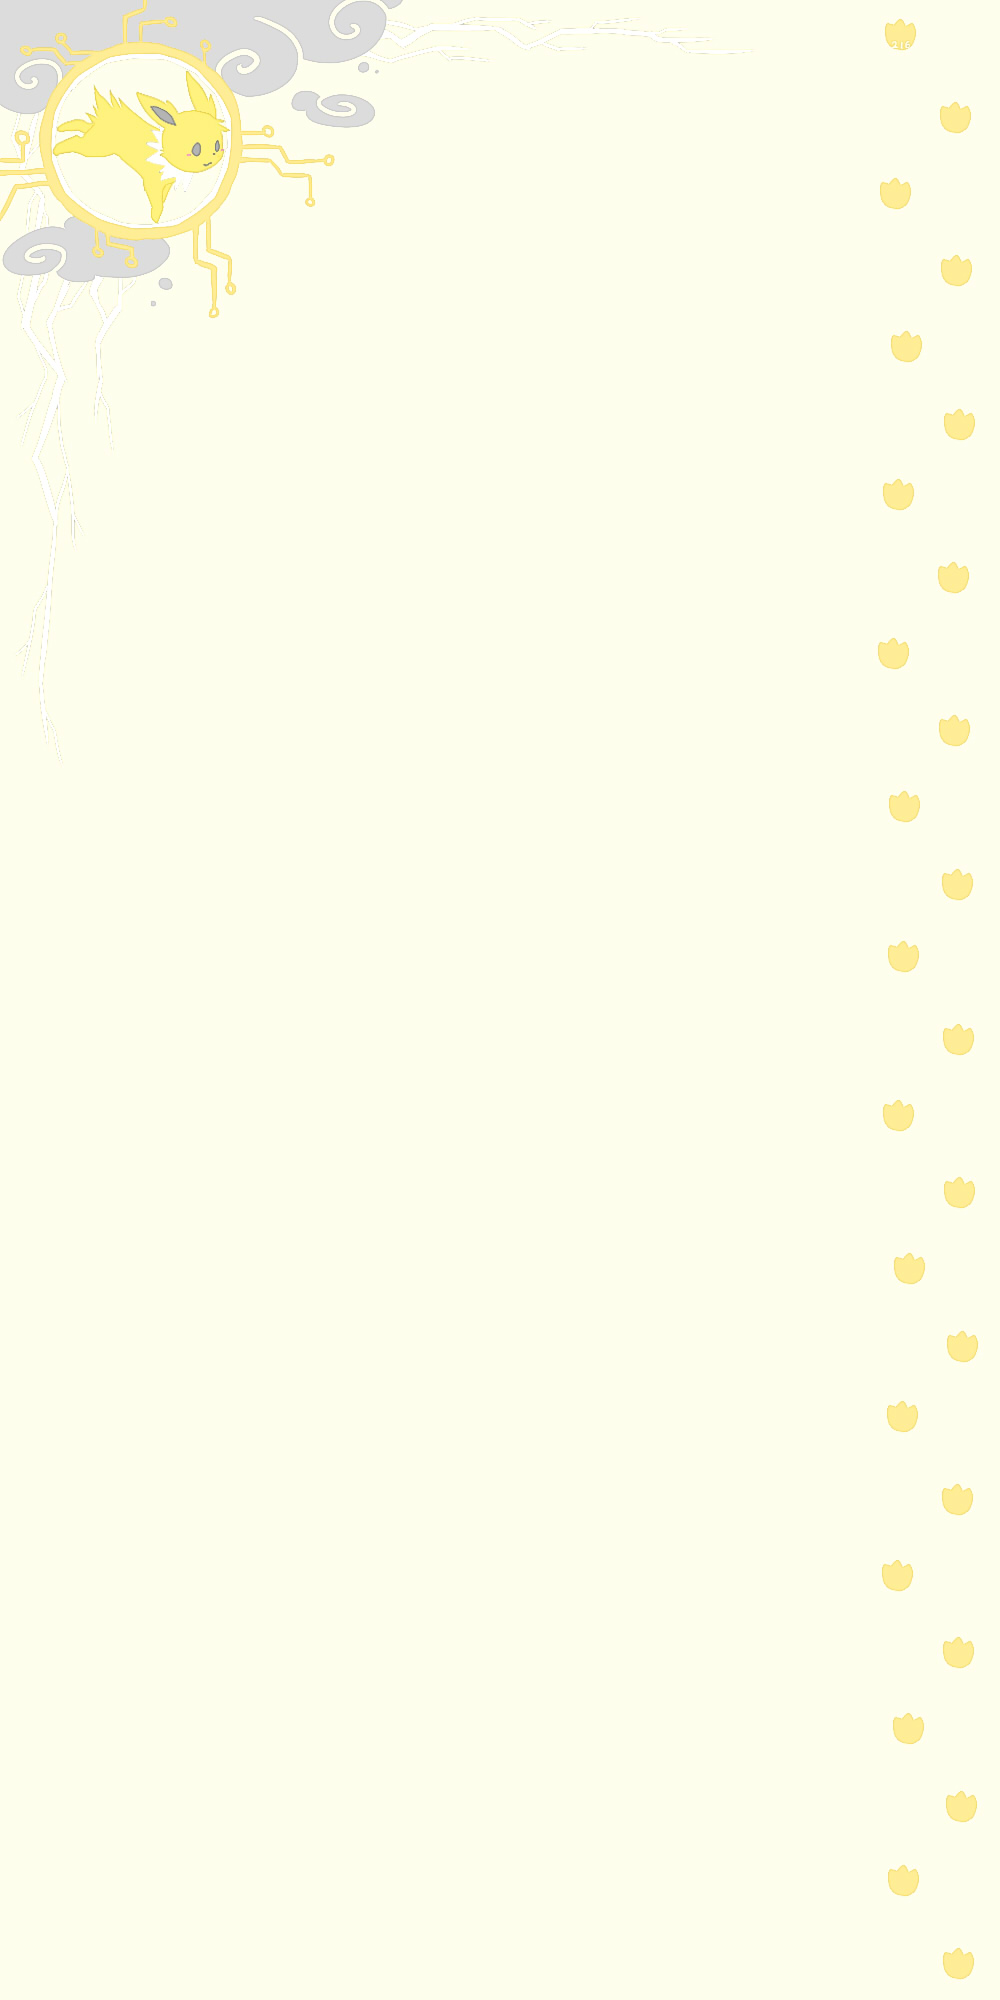 Jolteon Box Skin by 216th